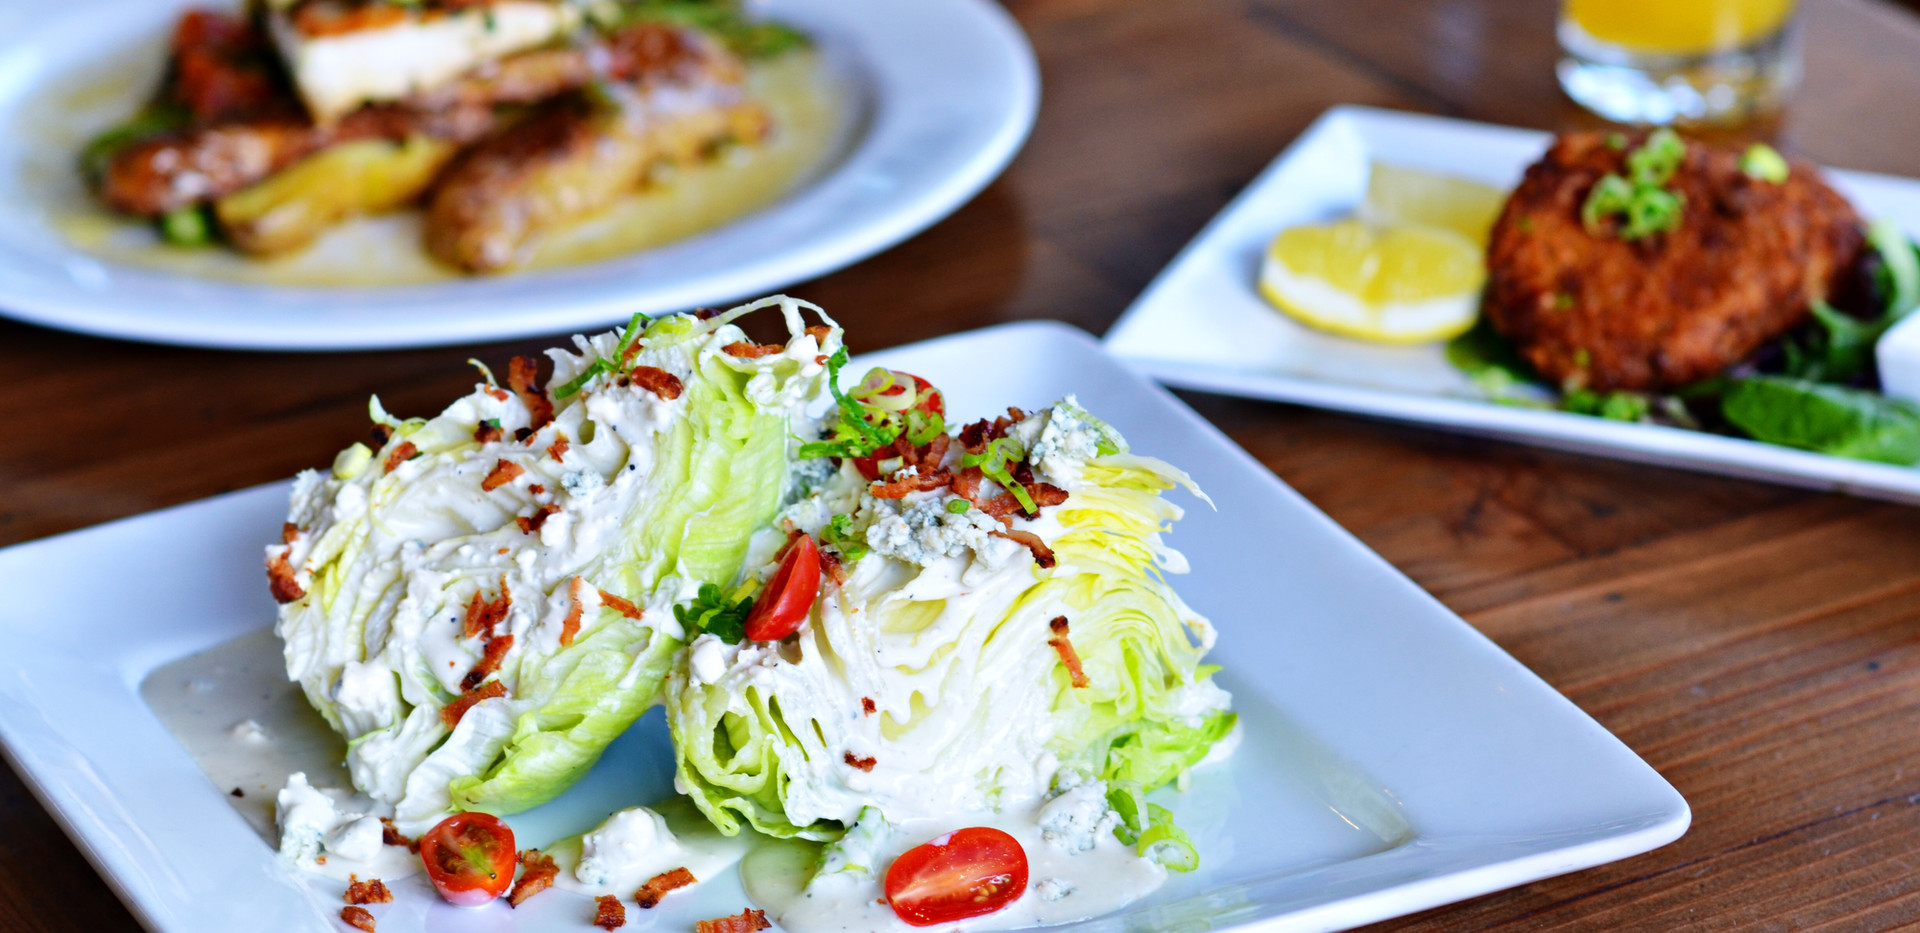 The Tin Lantern Bar & Grill. Sarah Nolivo. Marcello Nolivo. Great Food. Meadow Vista, CA.